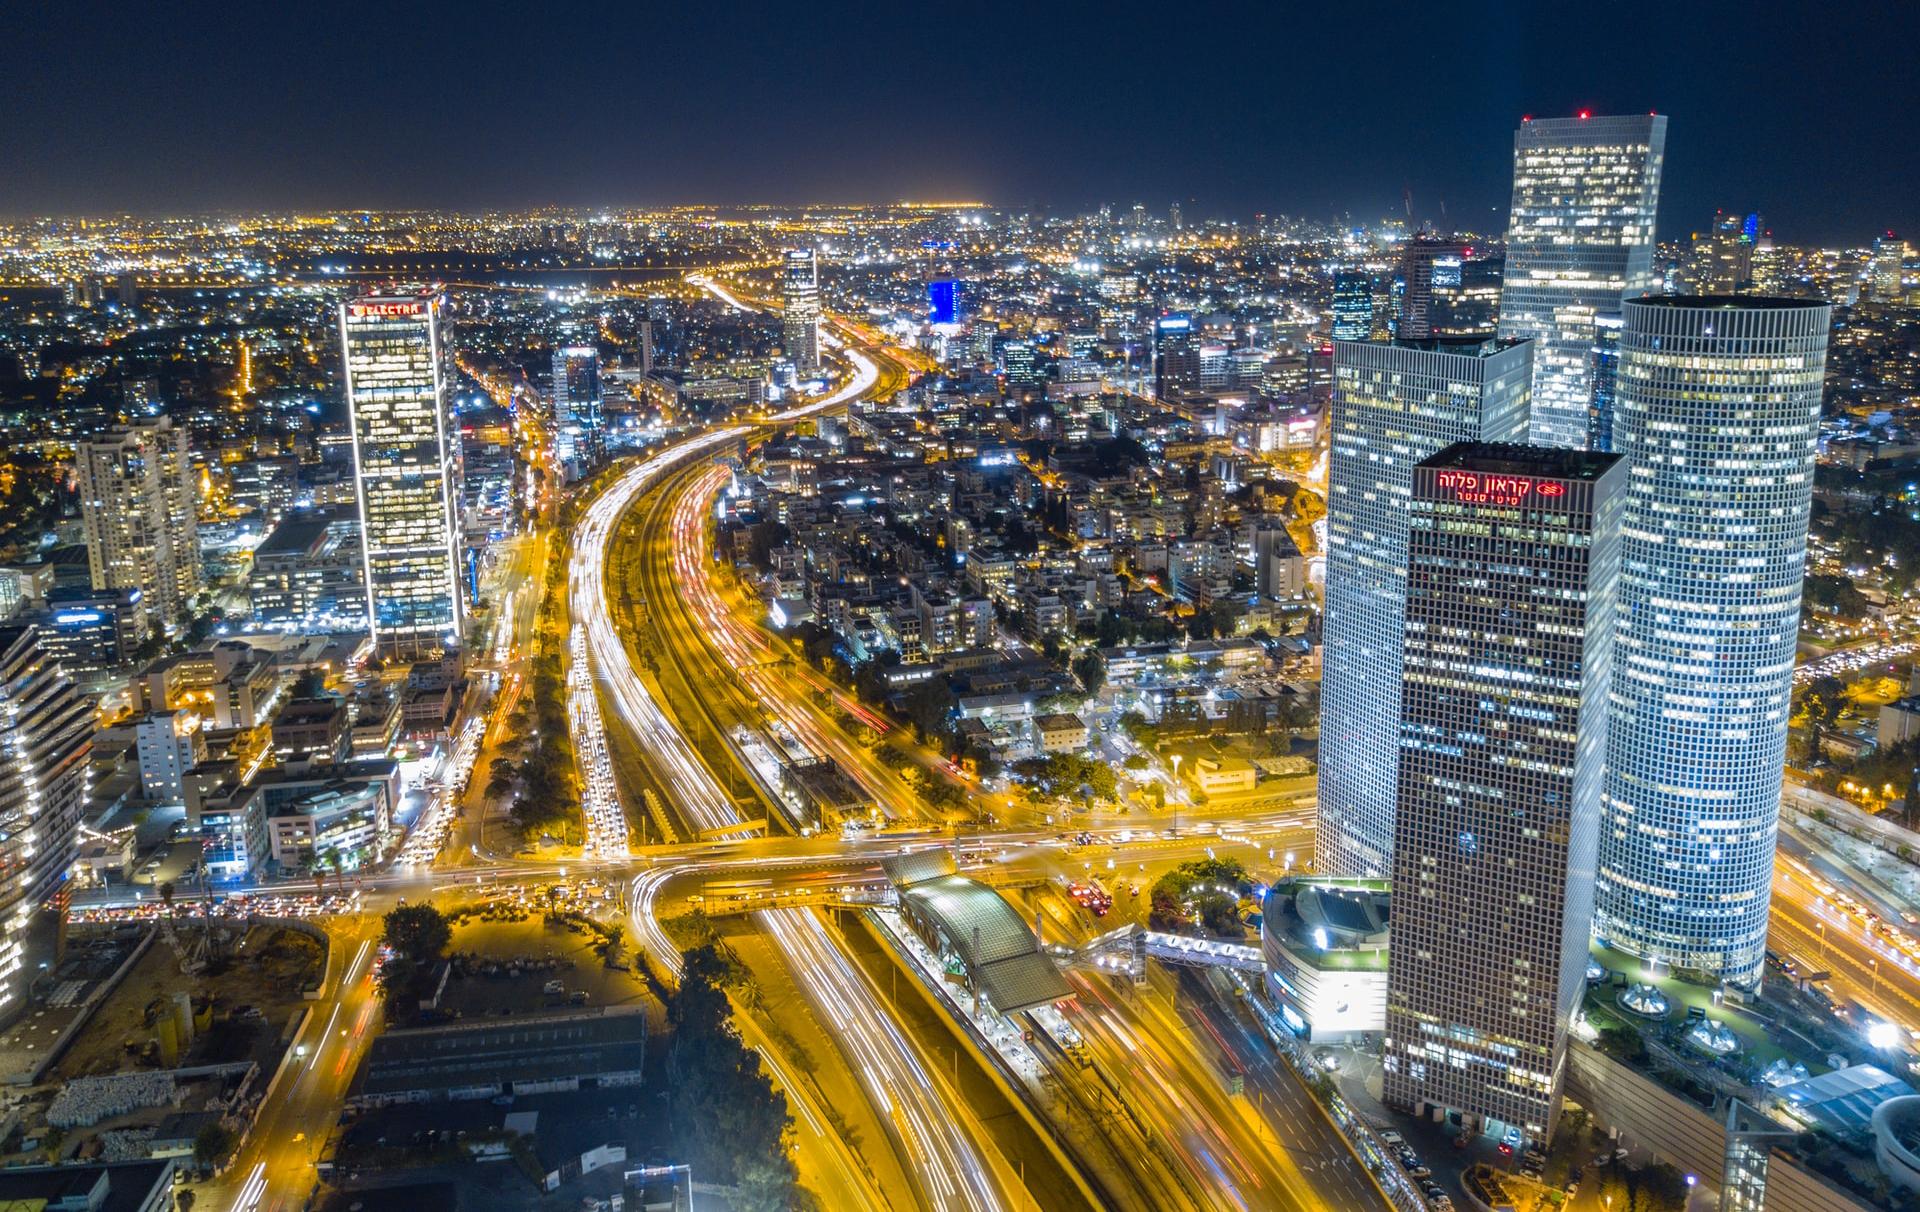 Tel Aviv: A City On The Move